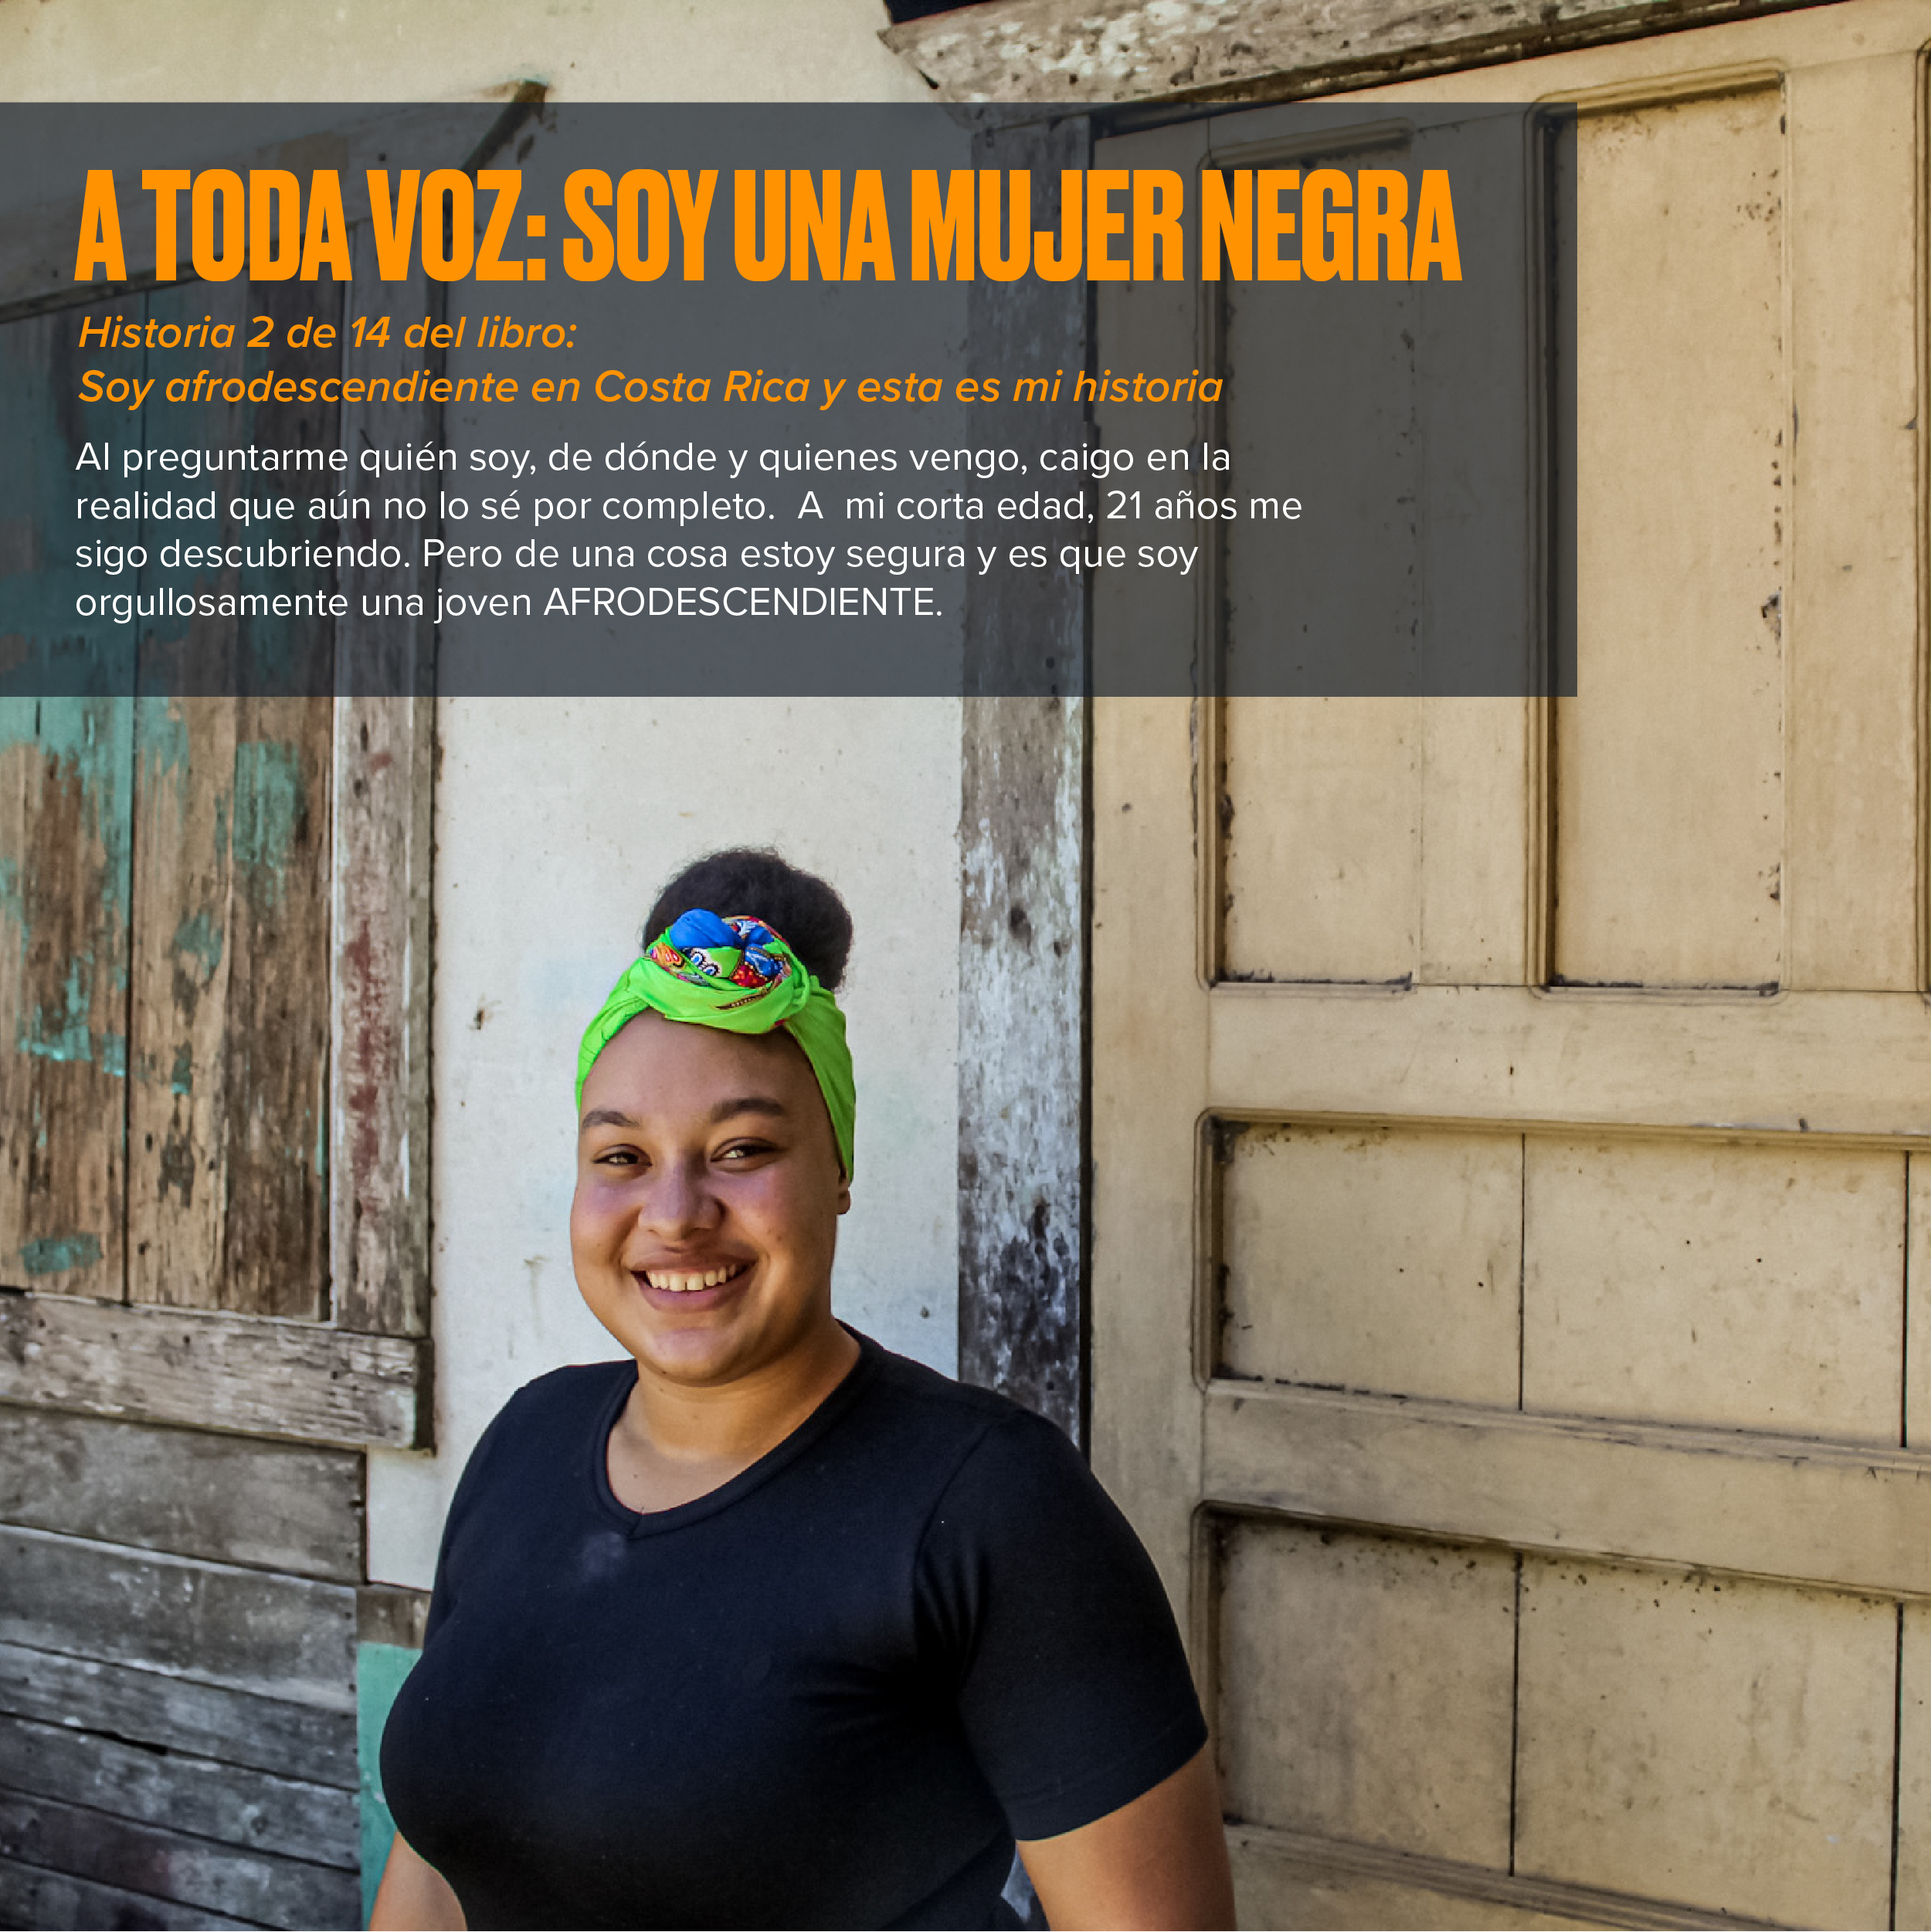 A toda voz, Soy mujer negra: Historias afrodescendientes